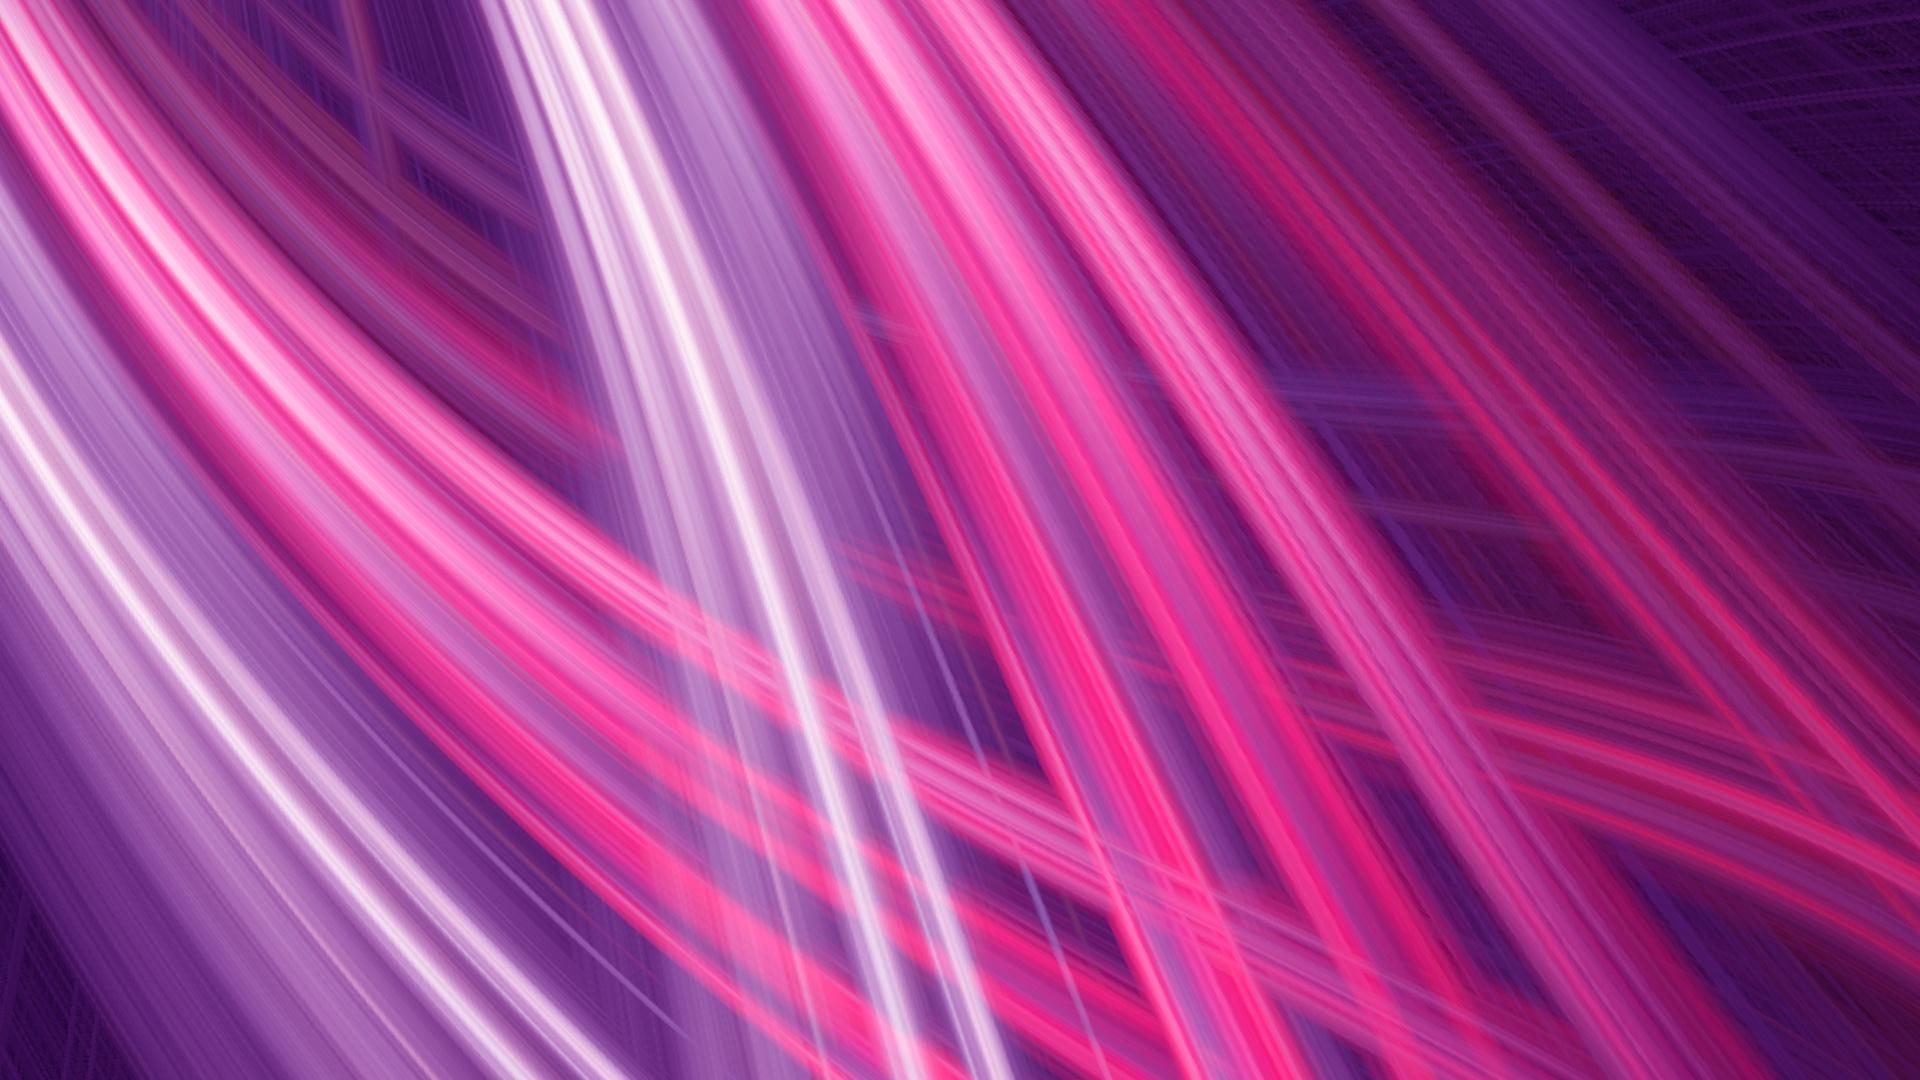 purple-abstract-art-4k-zu.jpg